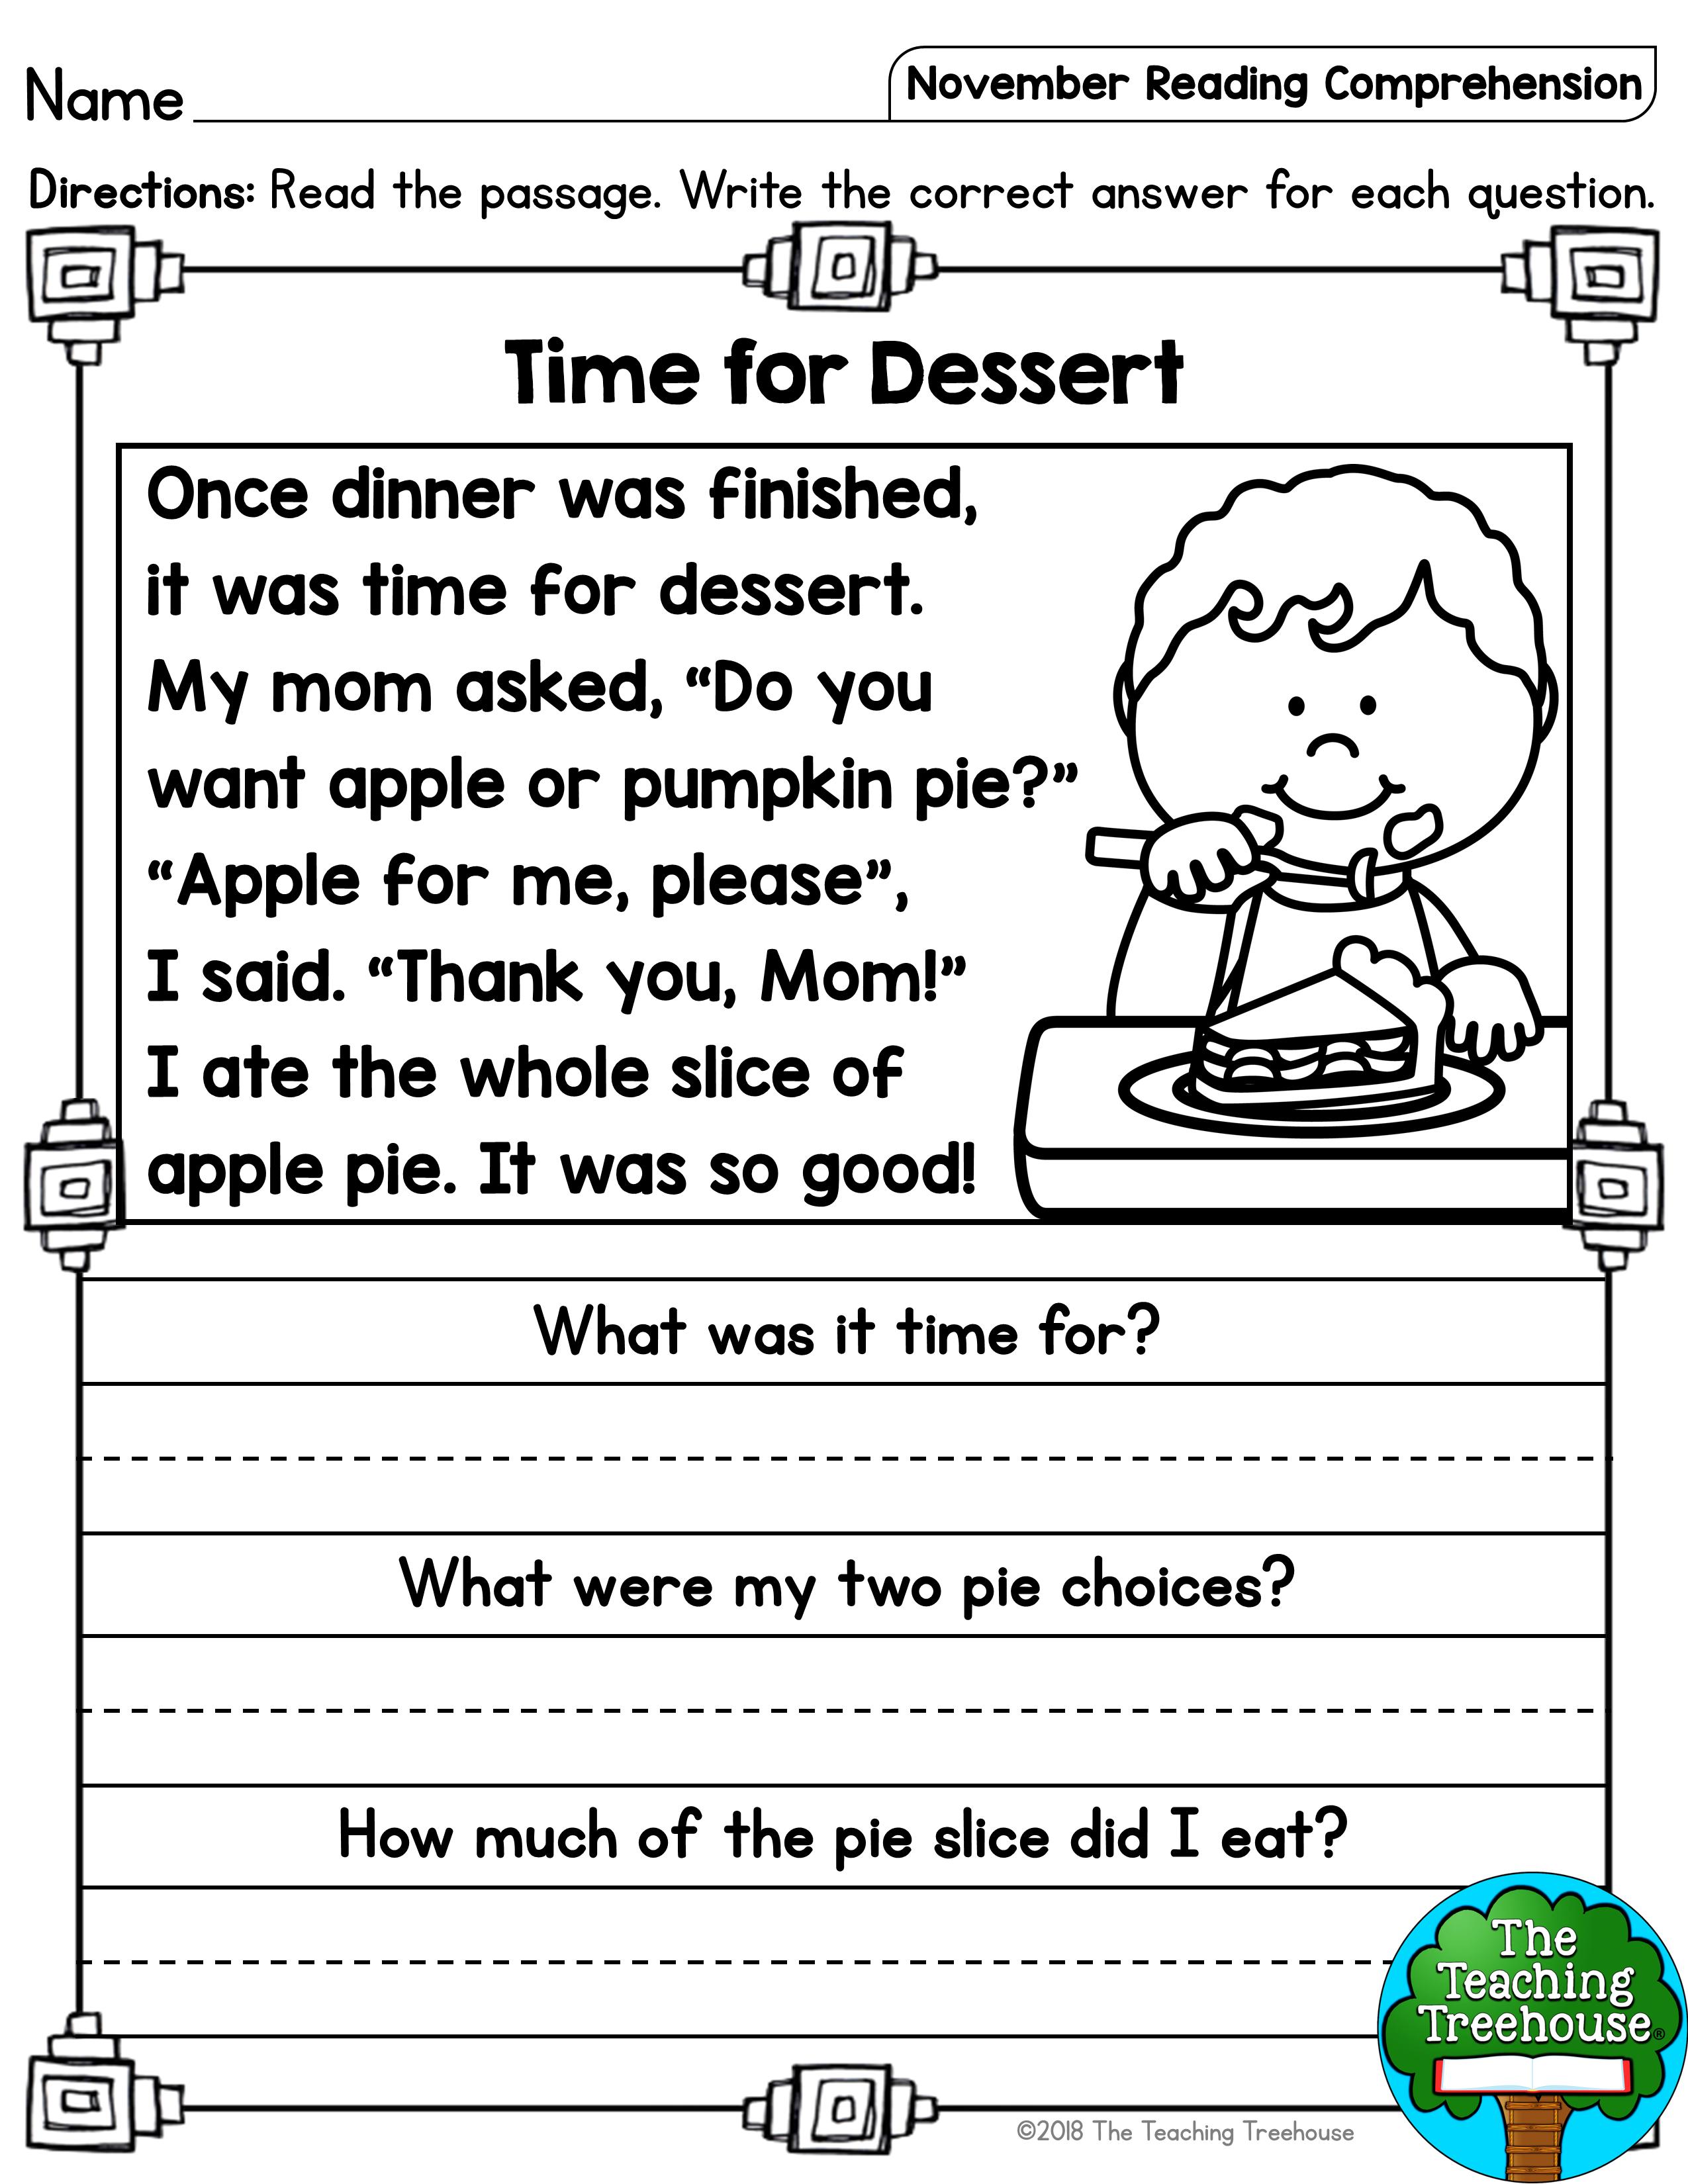 - November Reading Comprehension Passages For Kindergarten And First